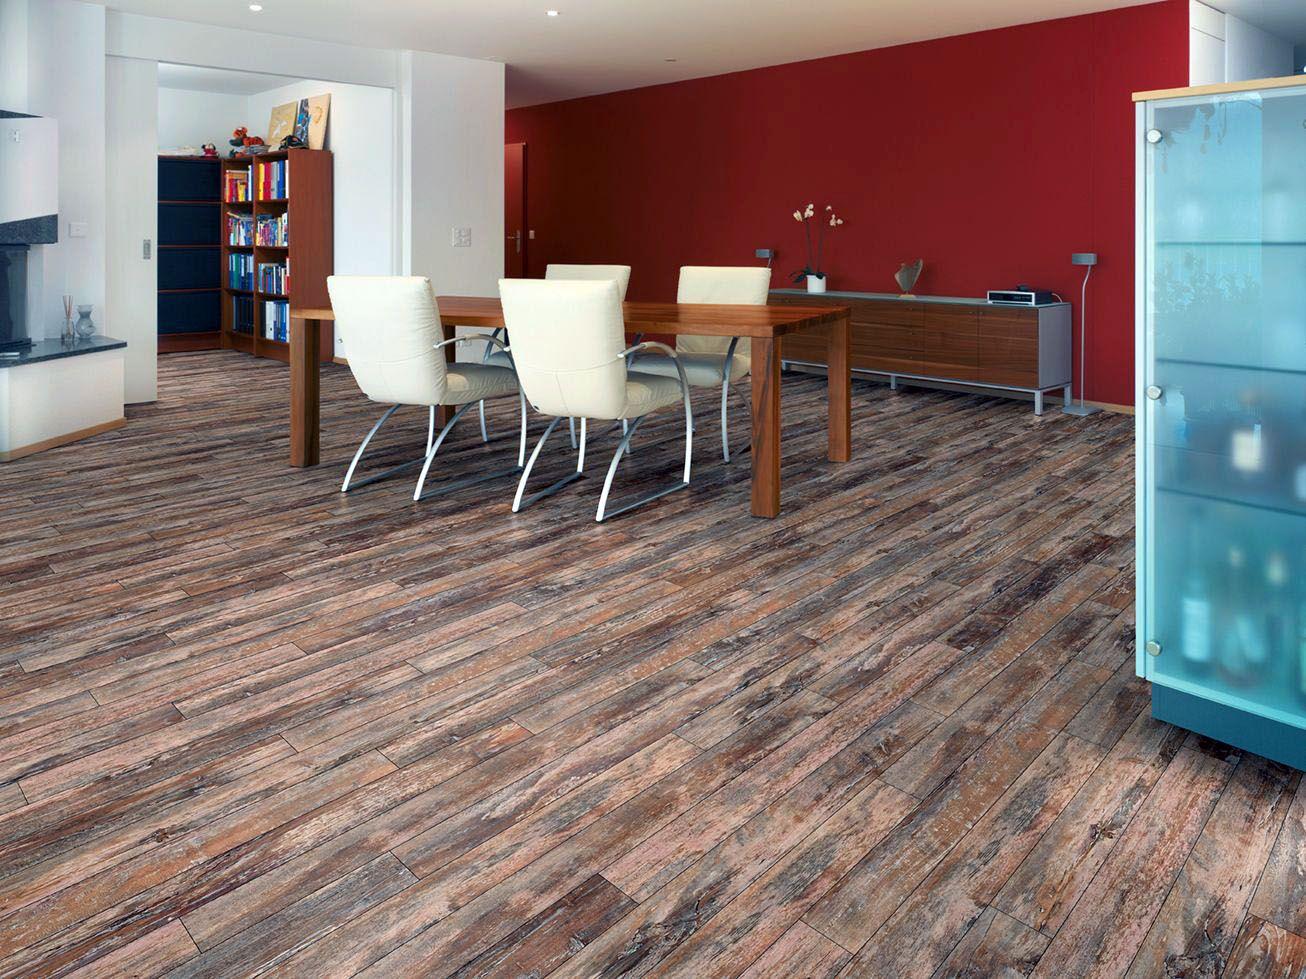 Leading Restroom Floor Covering Options Laminate Flooring Colors Floor Colors Best Laminate